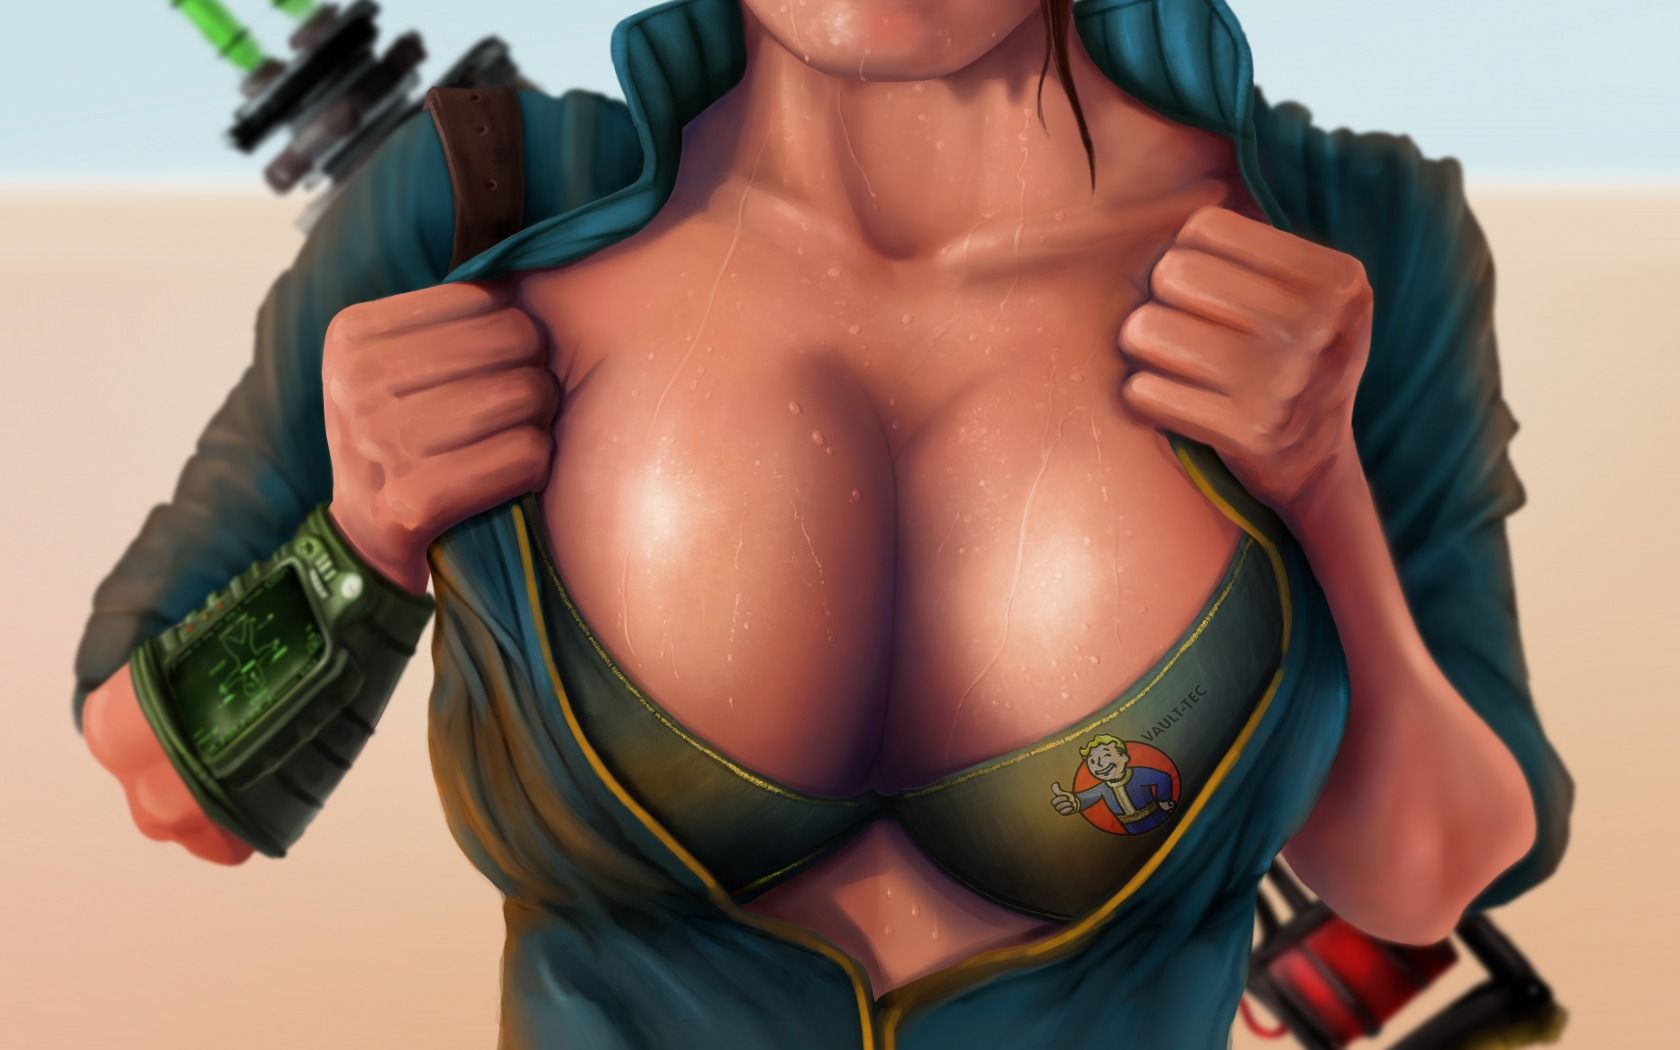 Girlfriens with big natural boobs